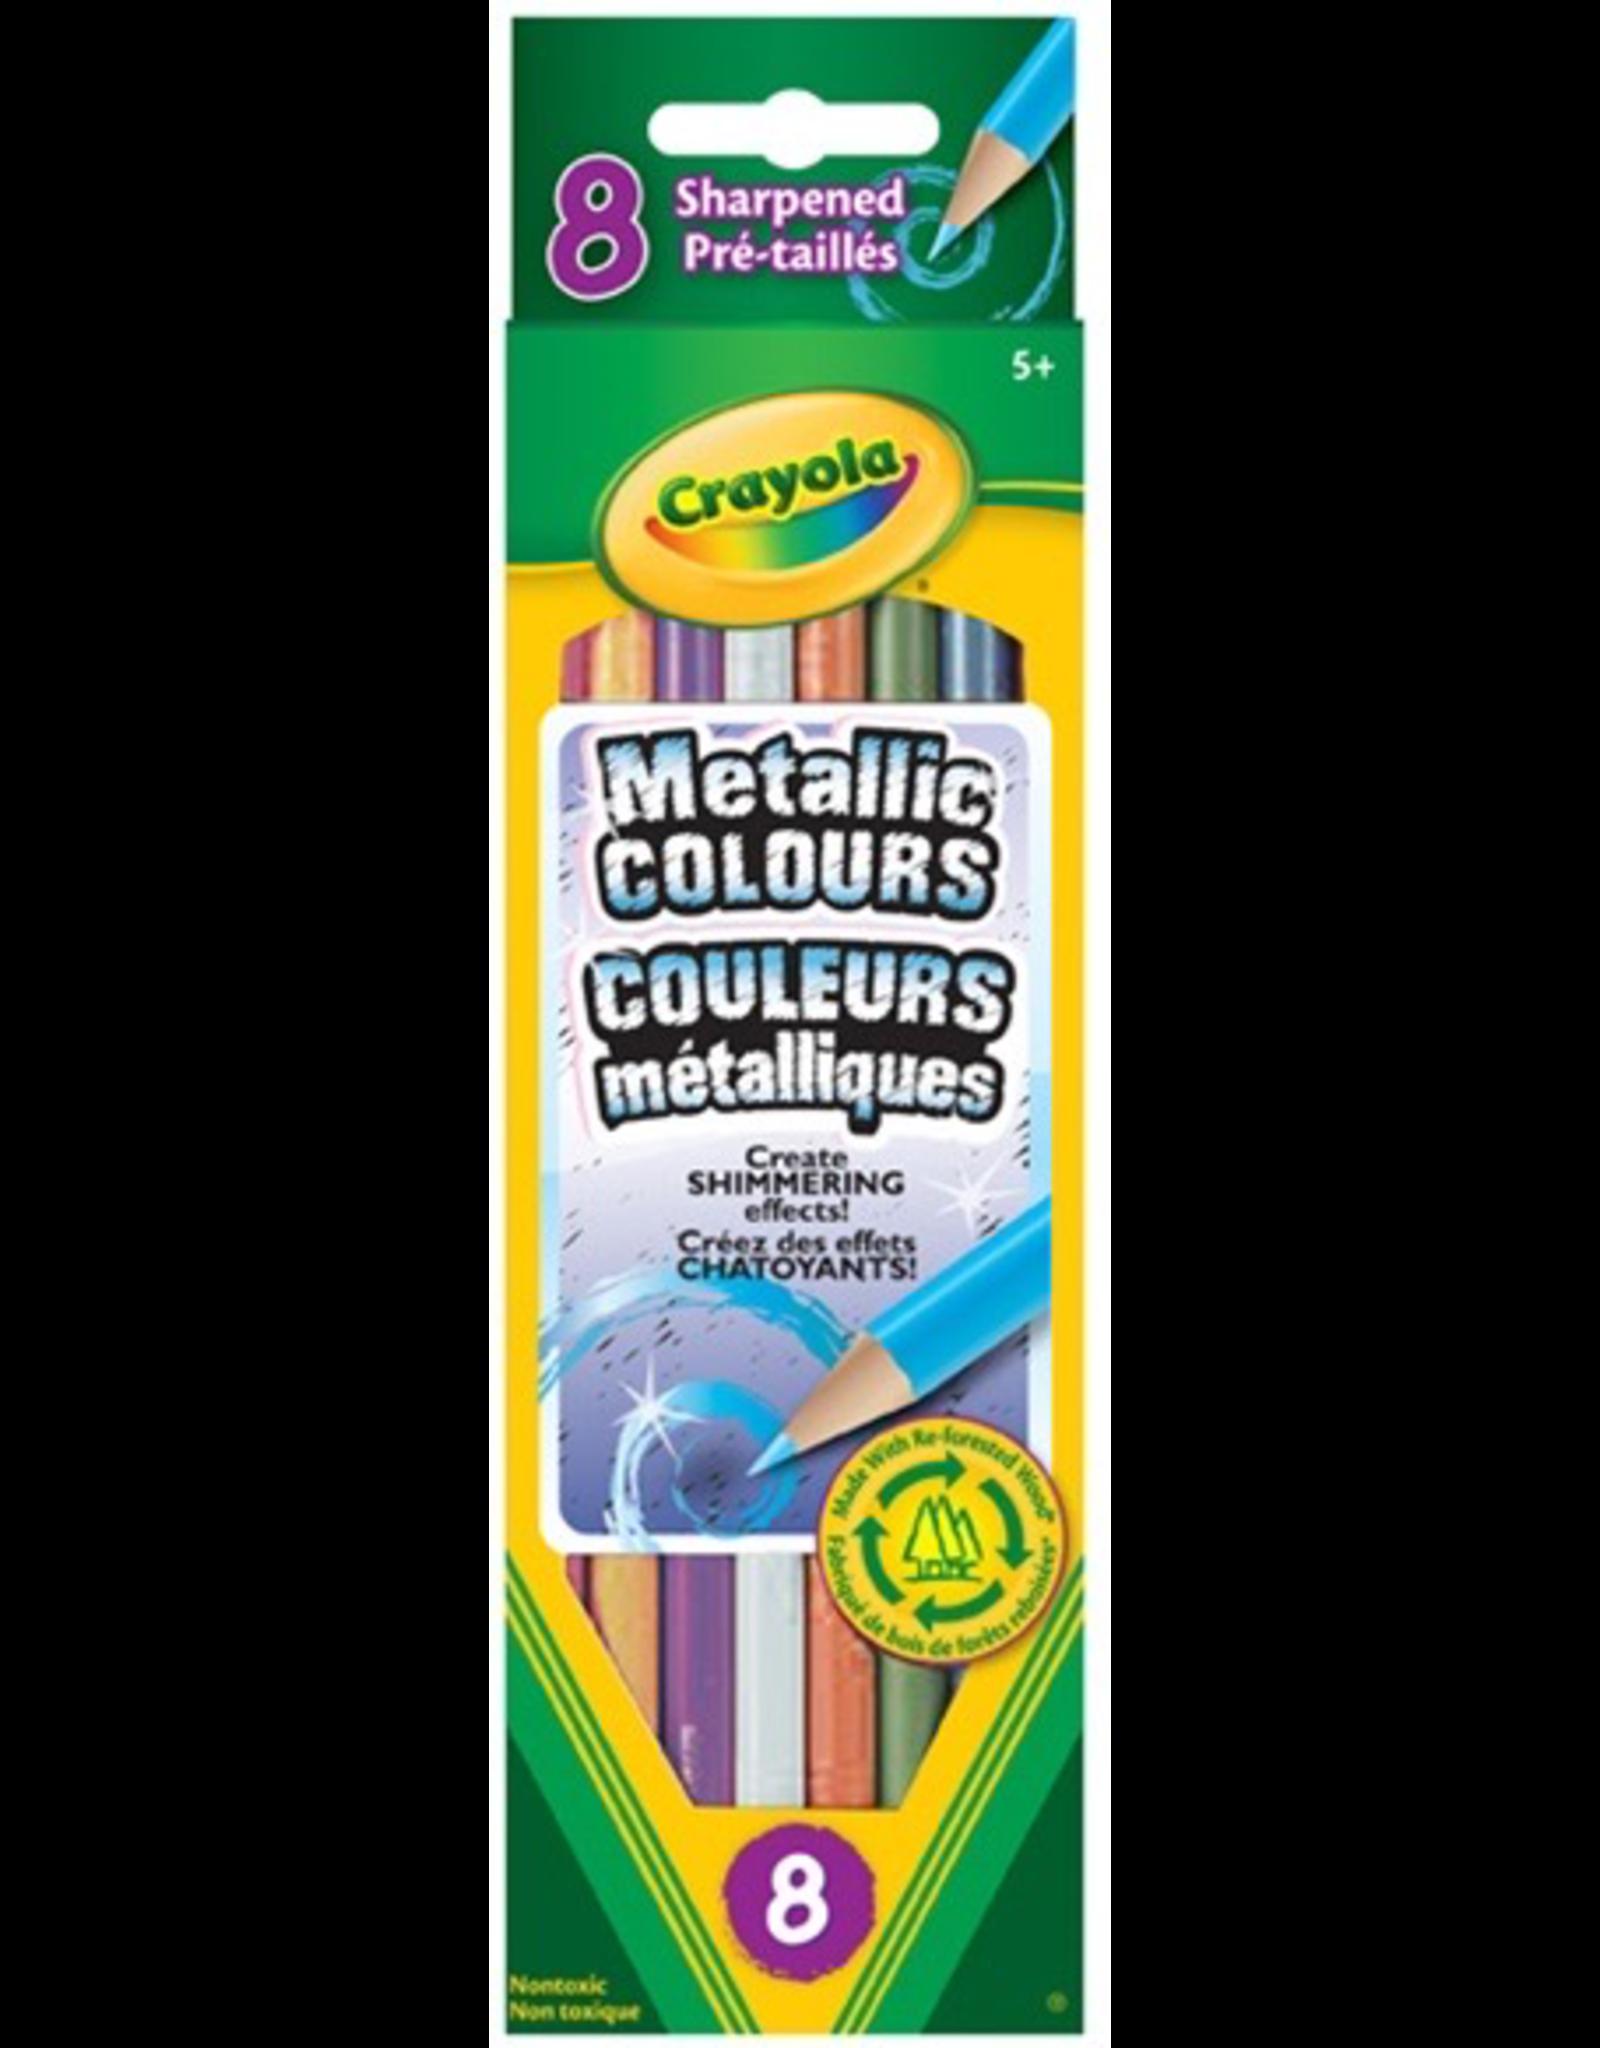 Crayola 8 METALLIC COLOURED PENCILS